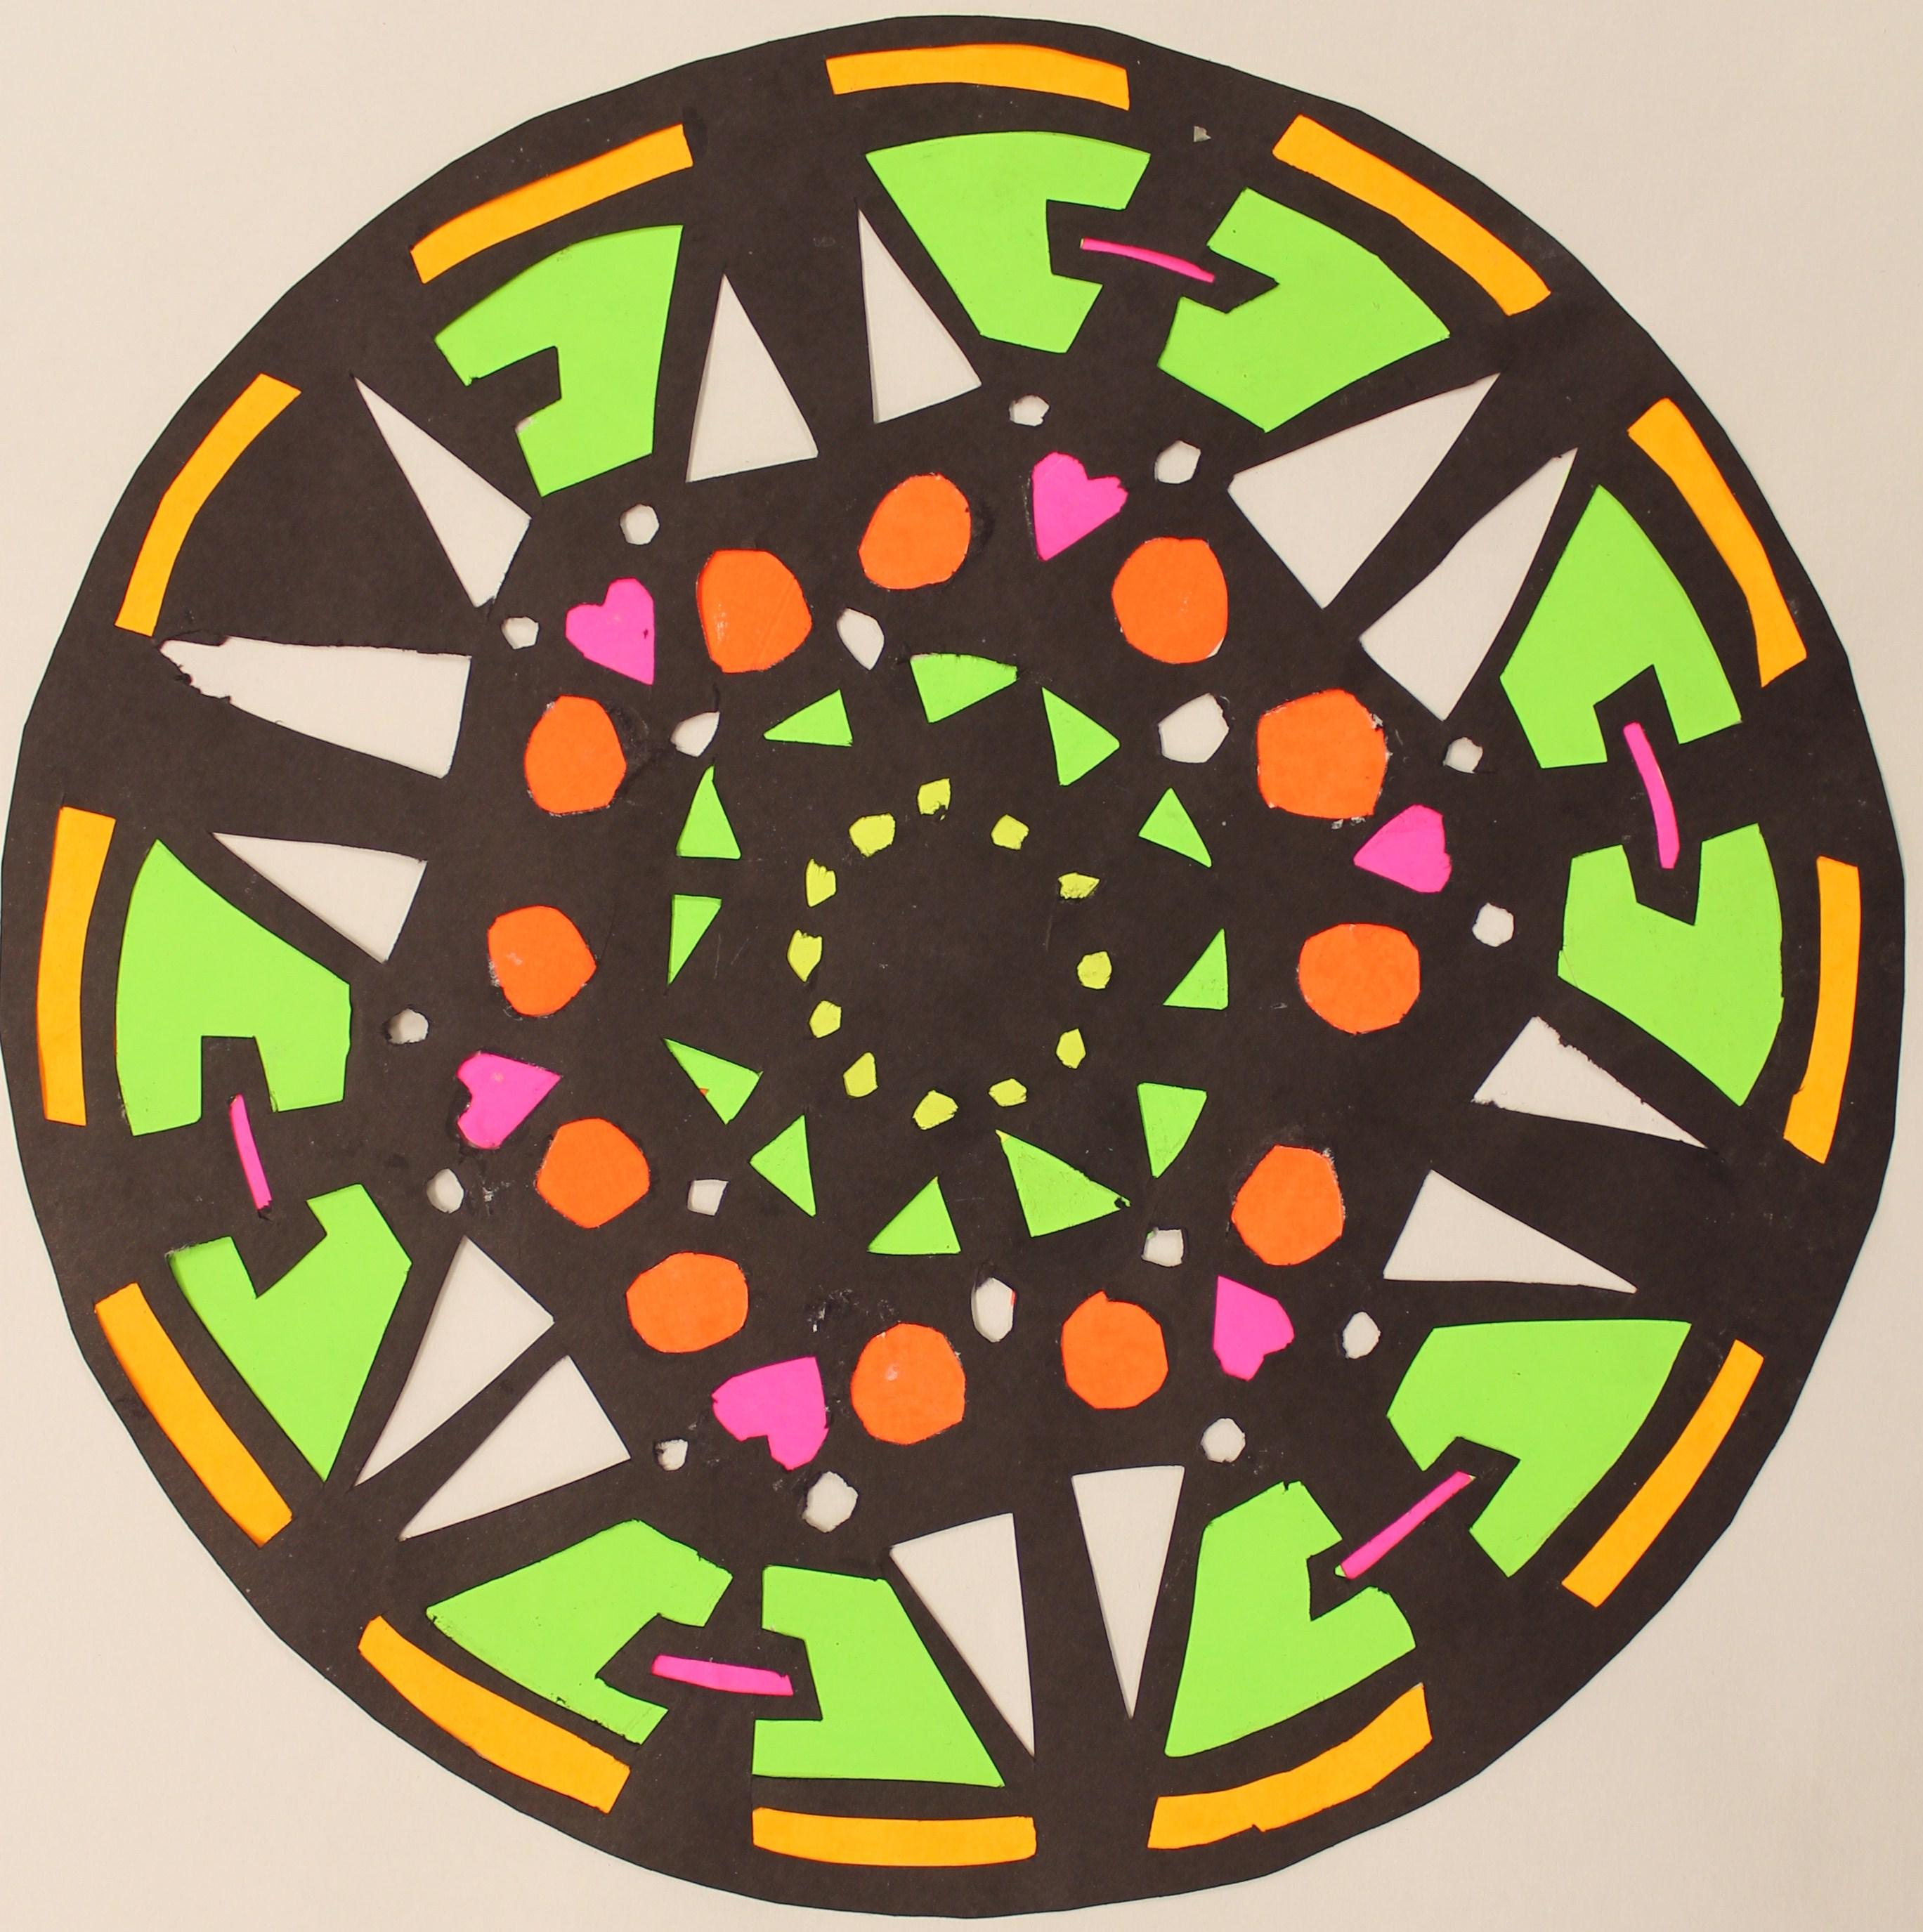 Radial Symmetry Paper Cutting 6th Grade Hamburg Middle School